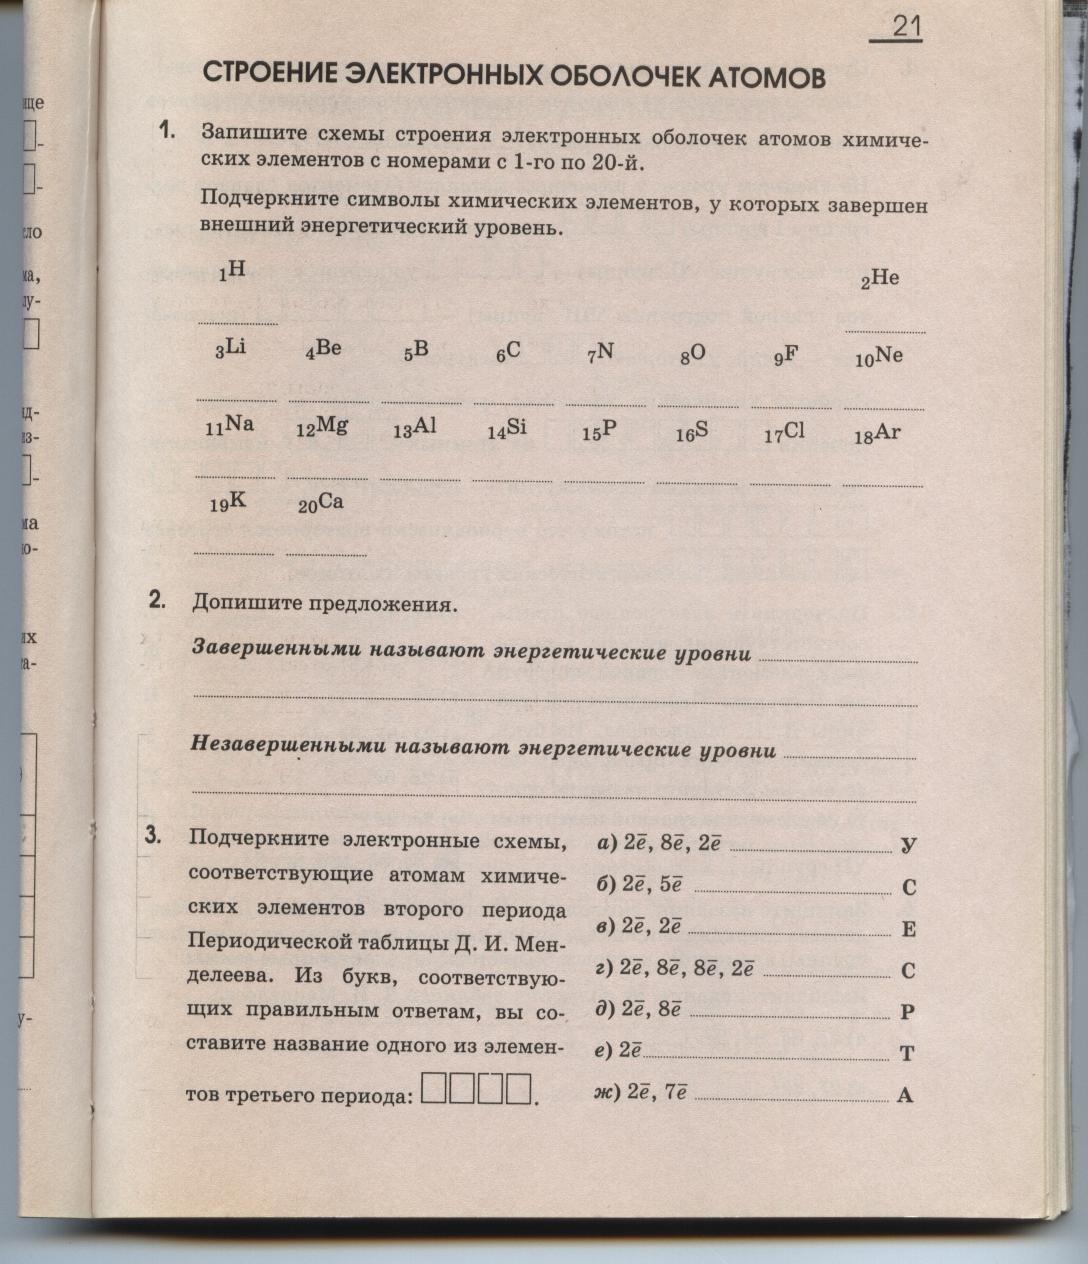 C:\Documents and Settings\Ученик\Мои документы\Задание 3.jpg